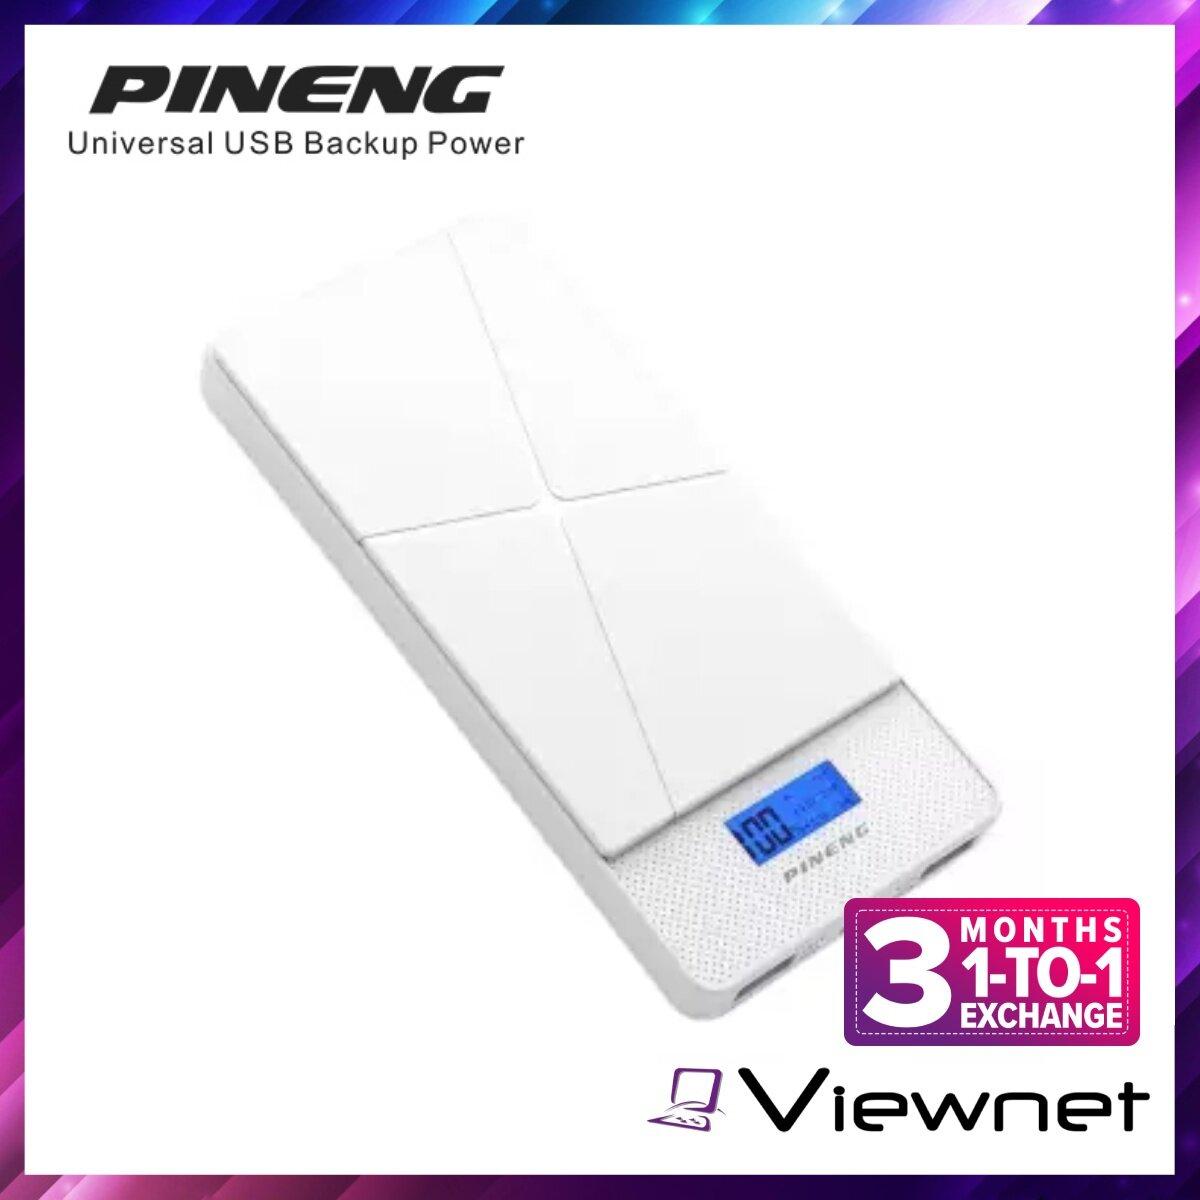 Pineng 10000mAh Lithium Polymer Slim Power Bank (PN983S), 2-Out 2.1A, 10000mAh 37Wh, Dual USB Output, White